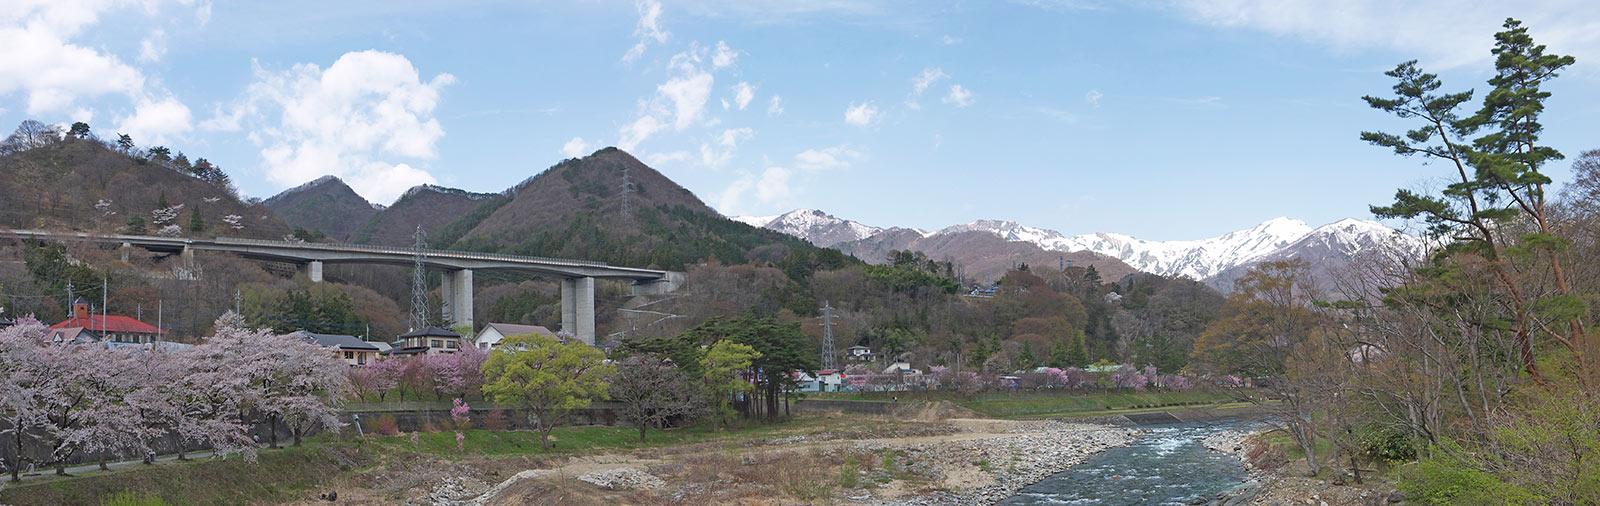 Минаками, Япония, Suwakyo Gorge